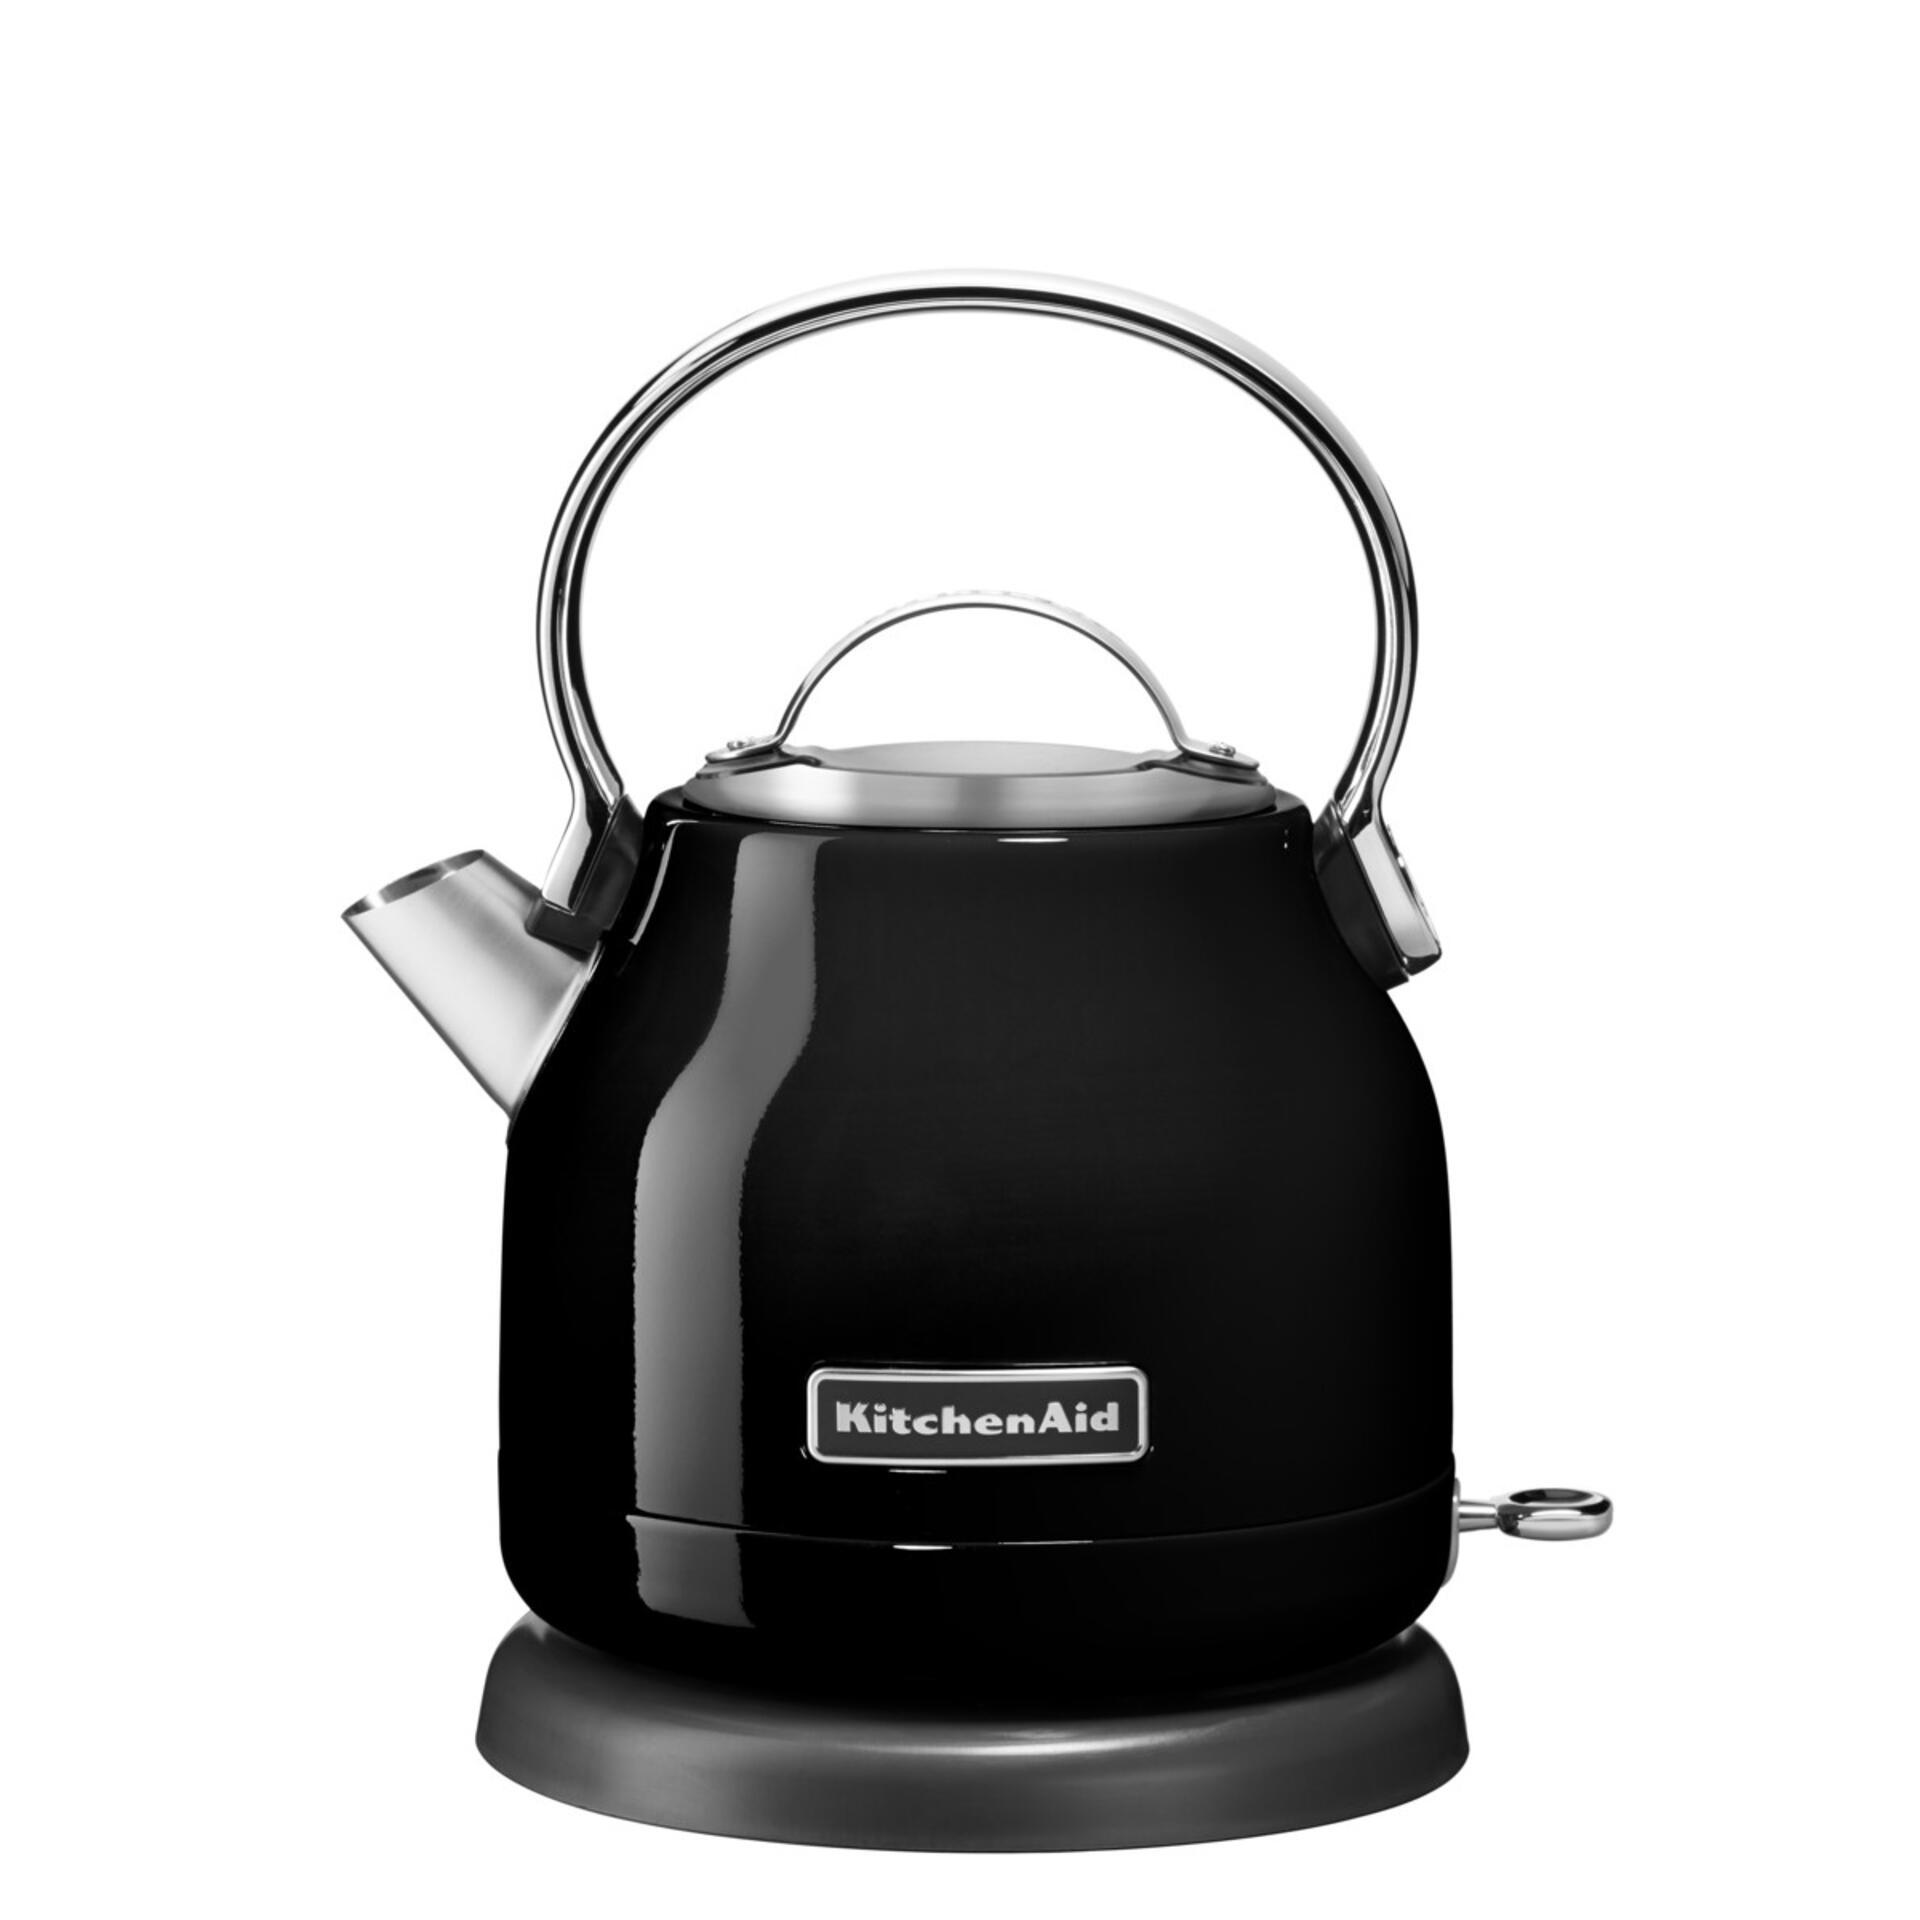 KitchenAid Classic Wasserkocher Onyx Schwarz 5KEK1222EOB